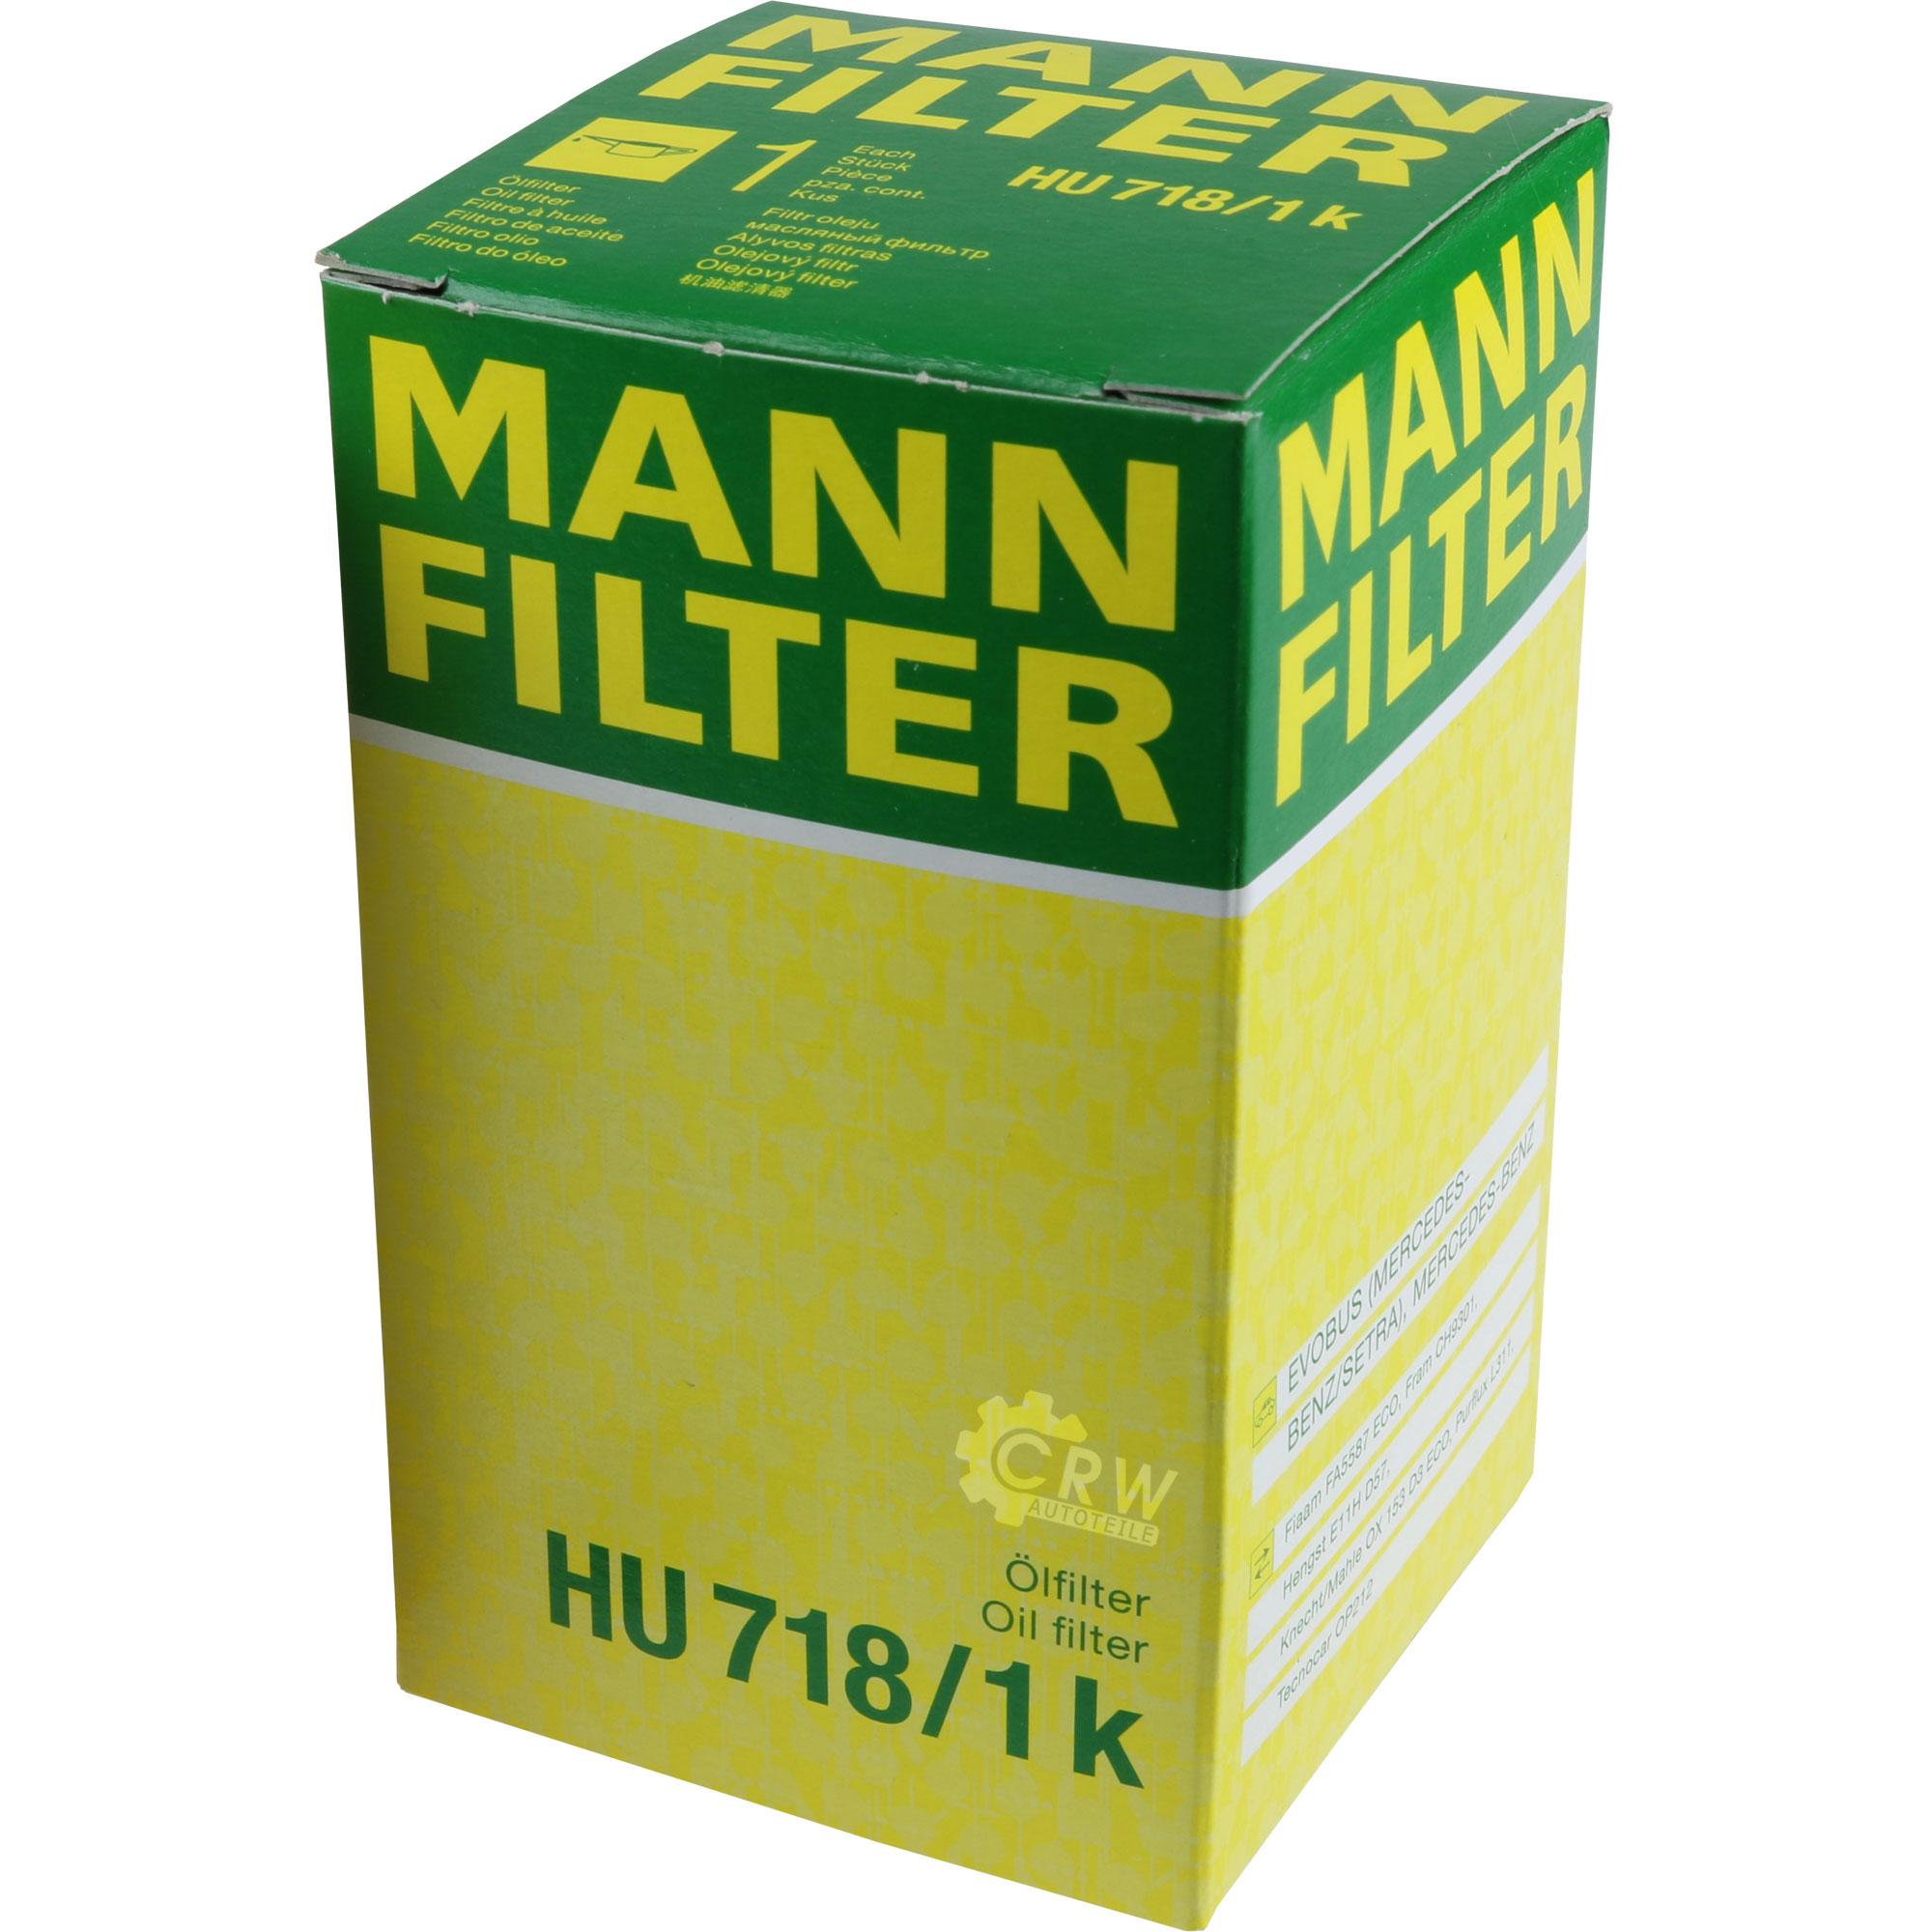 Motor-Ol-6L-MANNOL-Classic-10W-40-MANN-FILTER-Mercedes-Benz-C-Klasse-W202 Indexbild 11